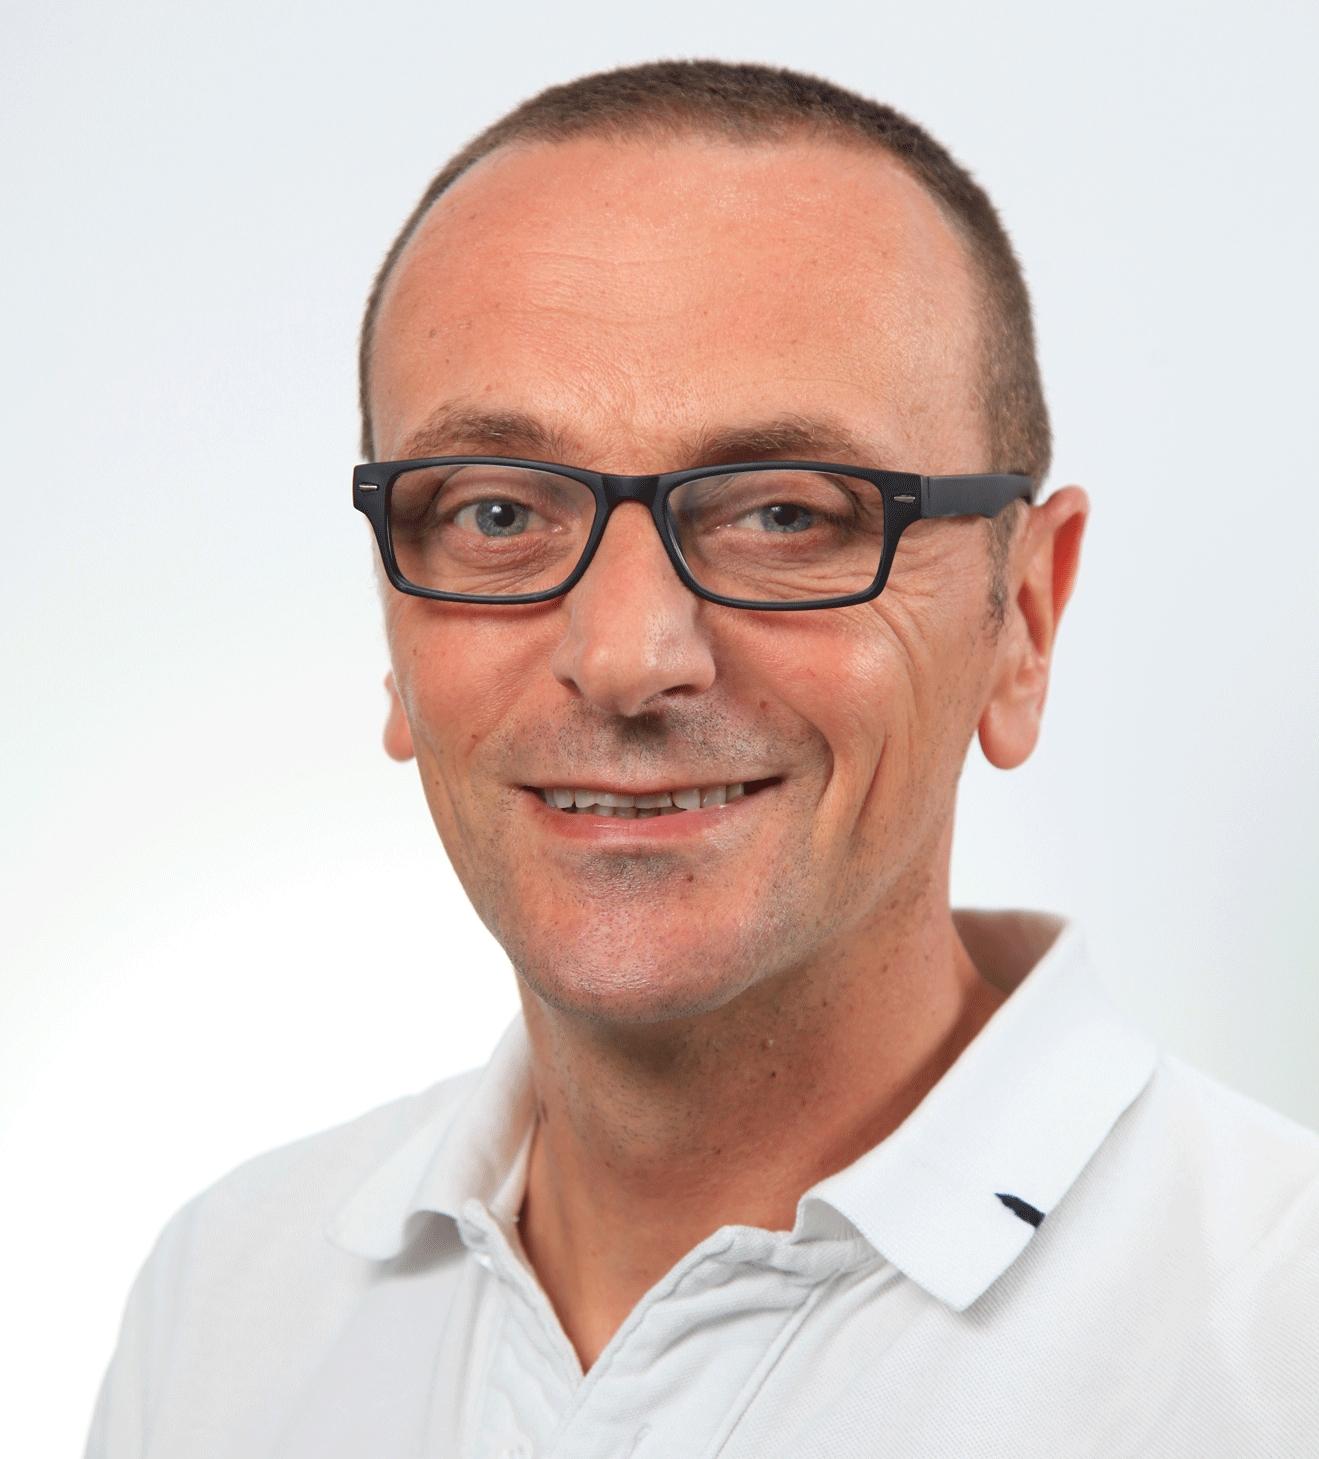 Mirco Bottero, Professional Services Business Development Manager Comparex Italia